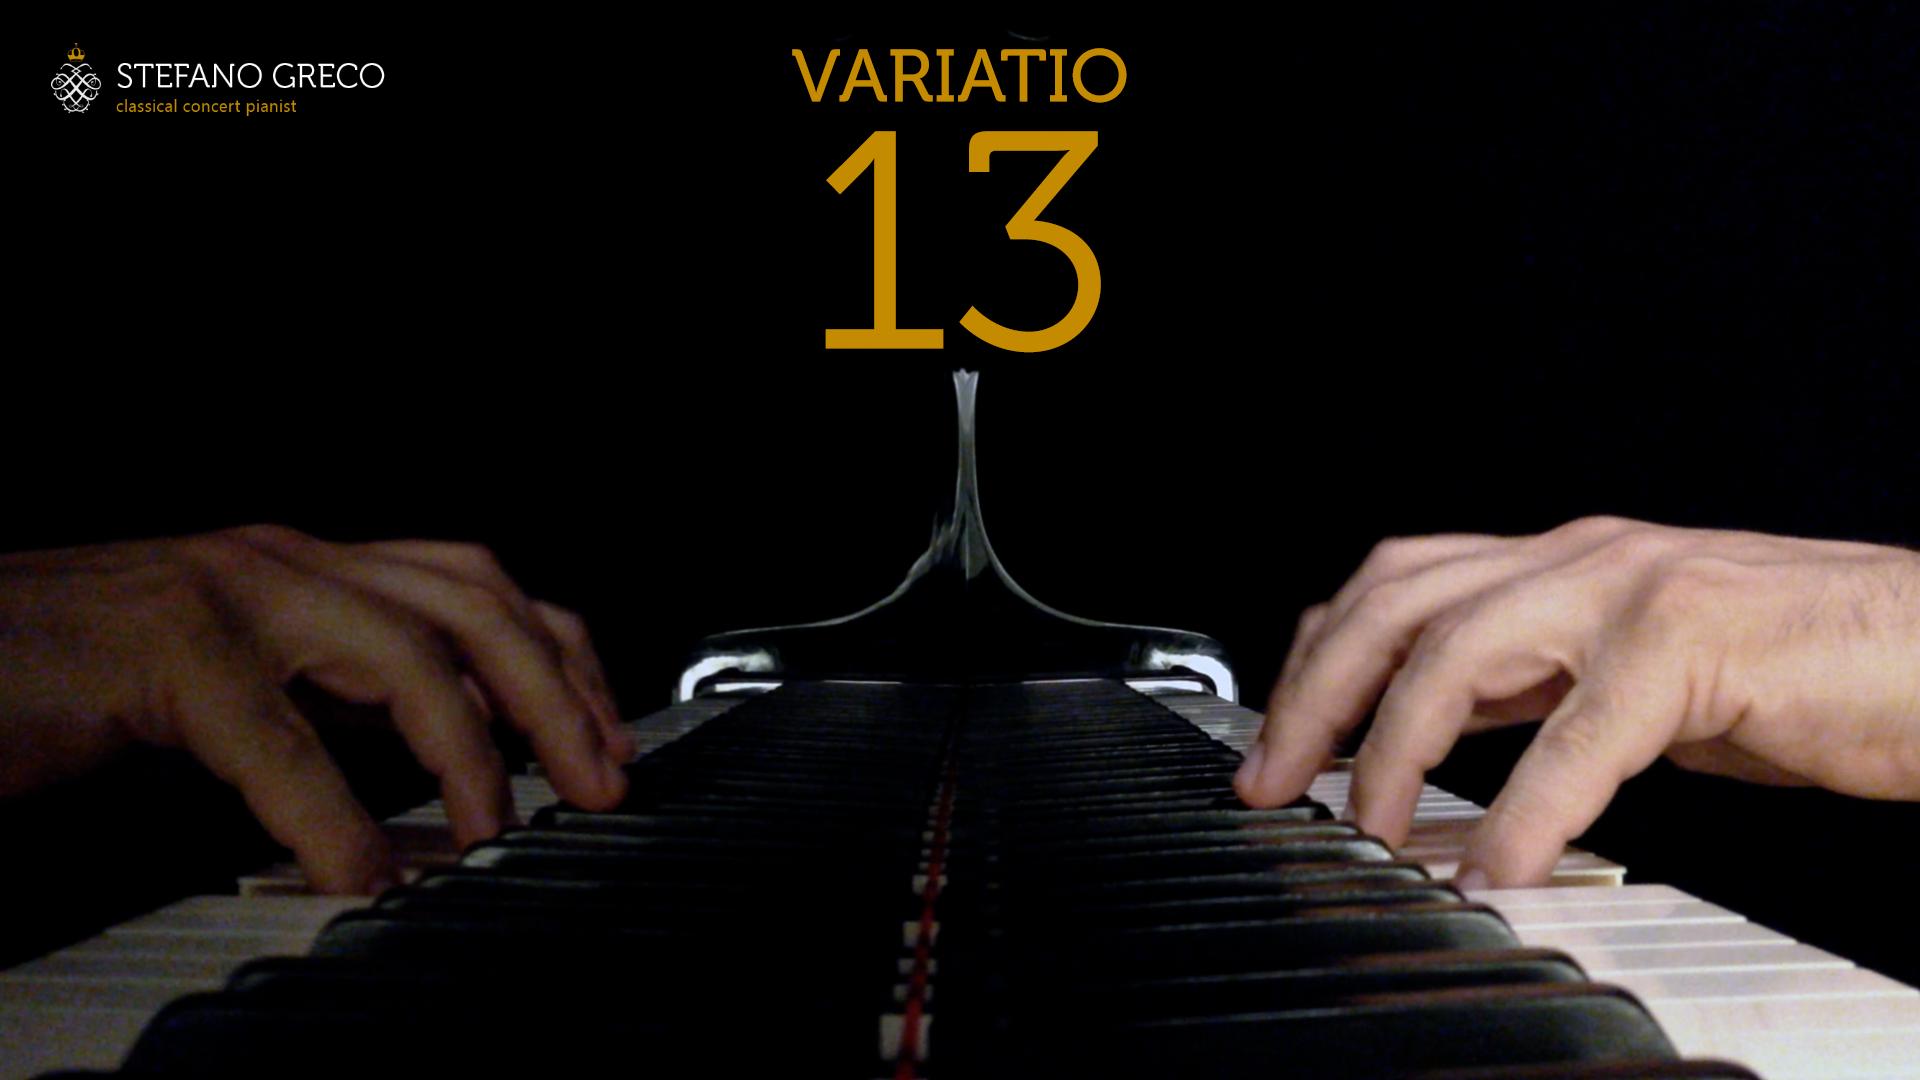 Bach. Goldberg Variations. Variatio XIII. Stefano Greco, piano